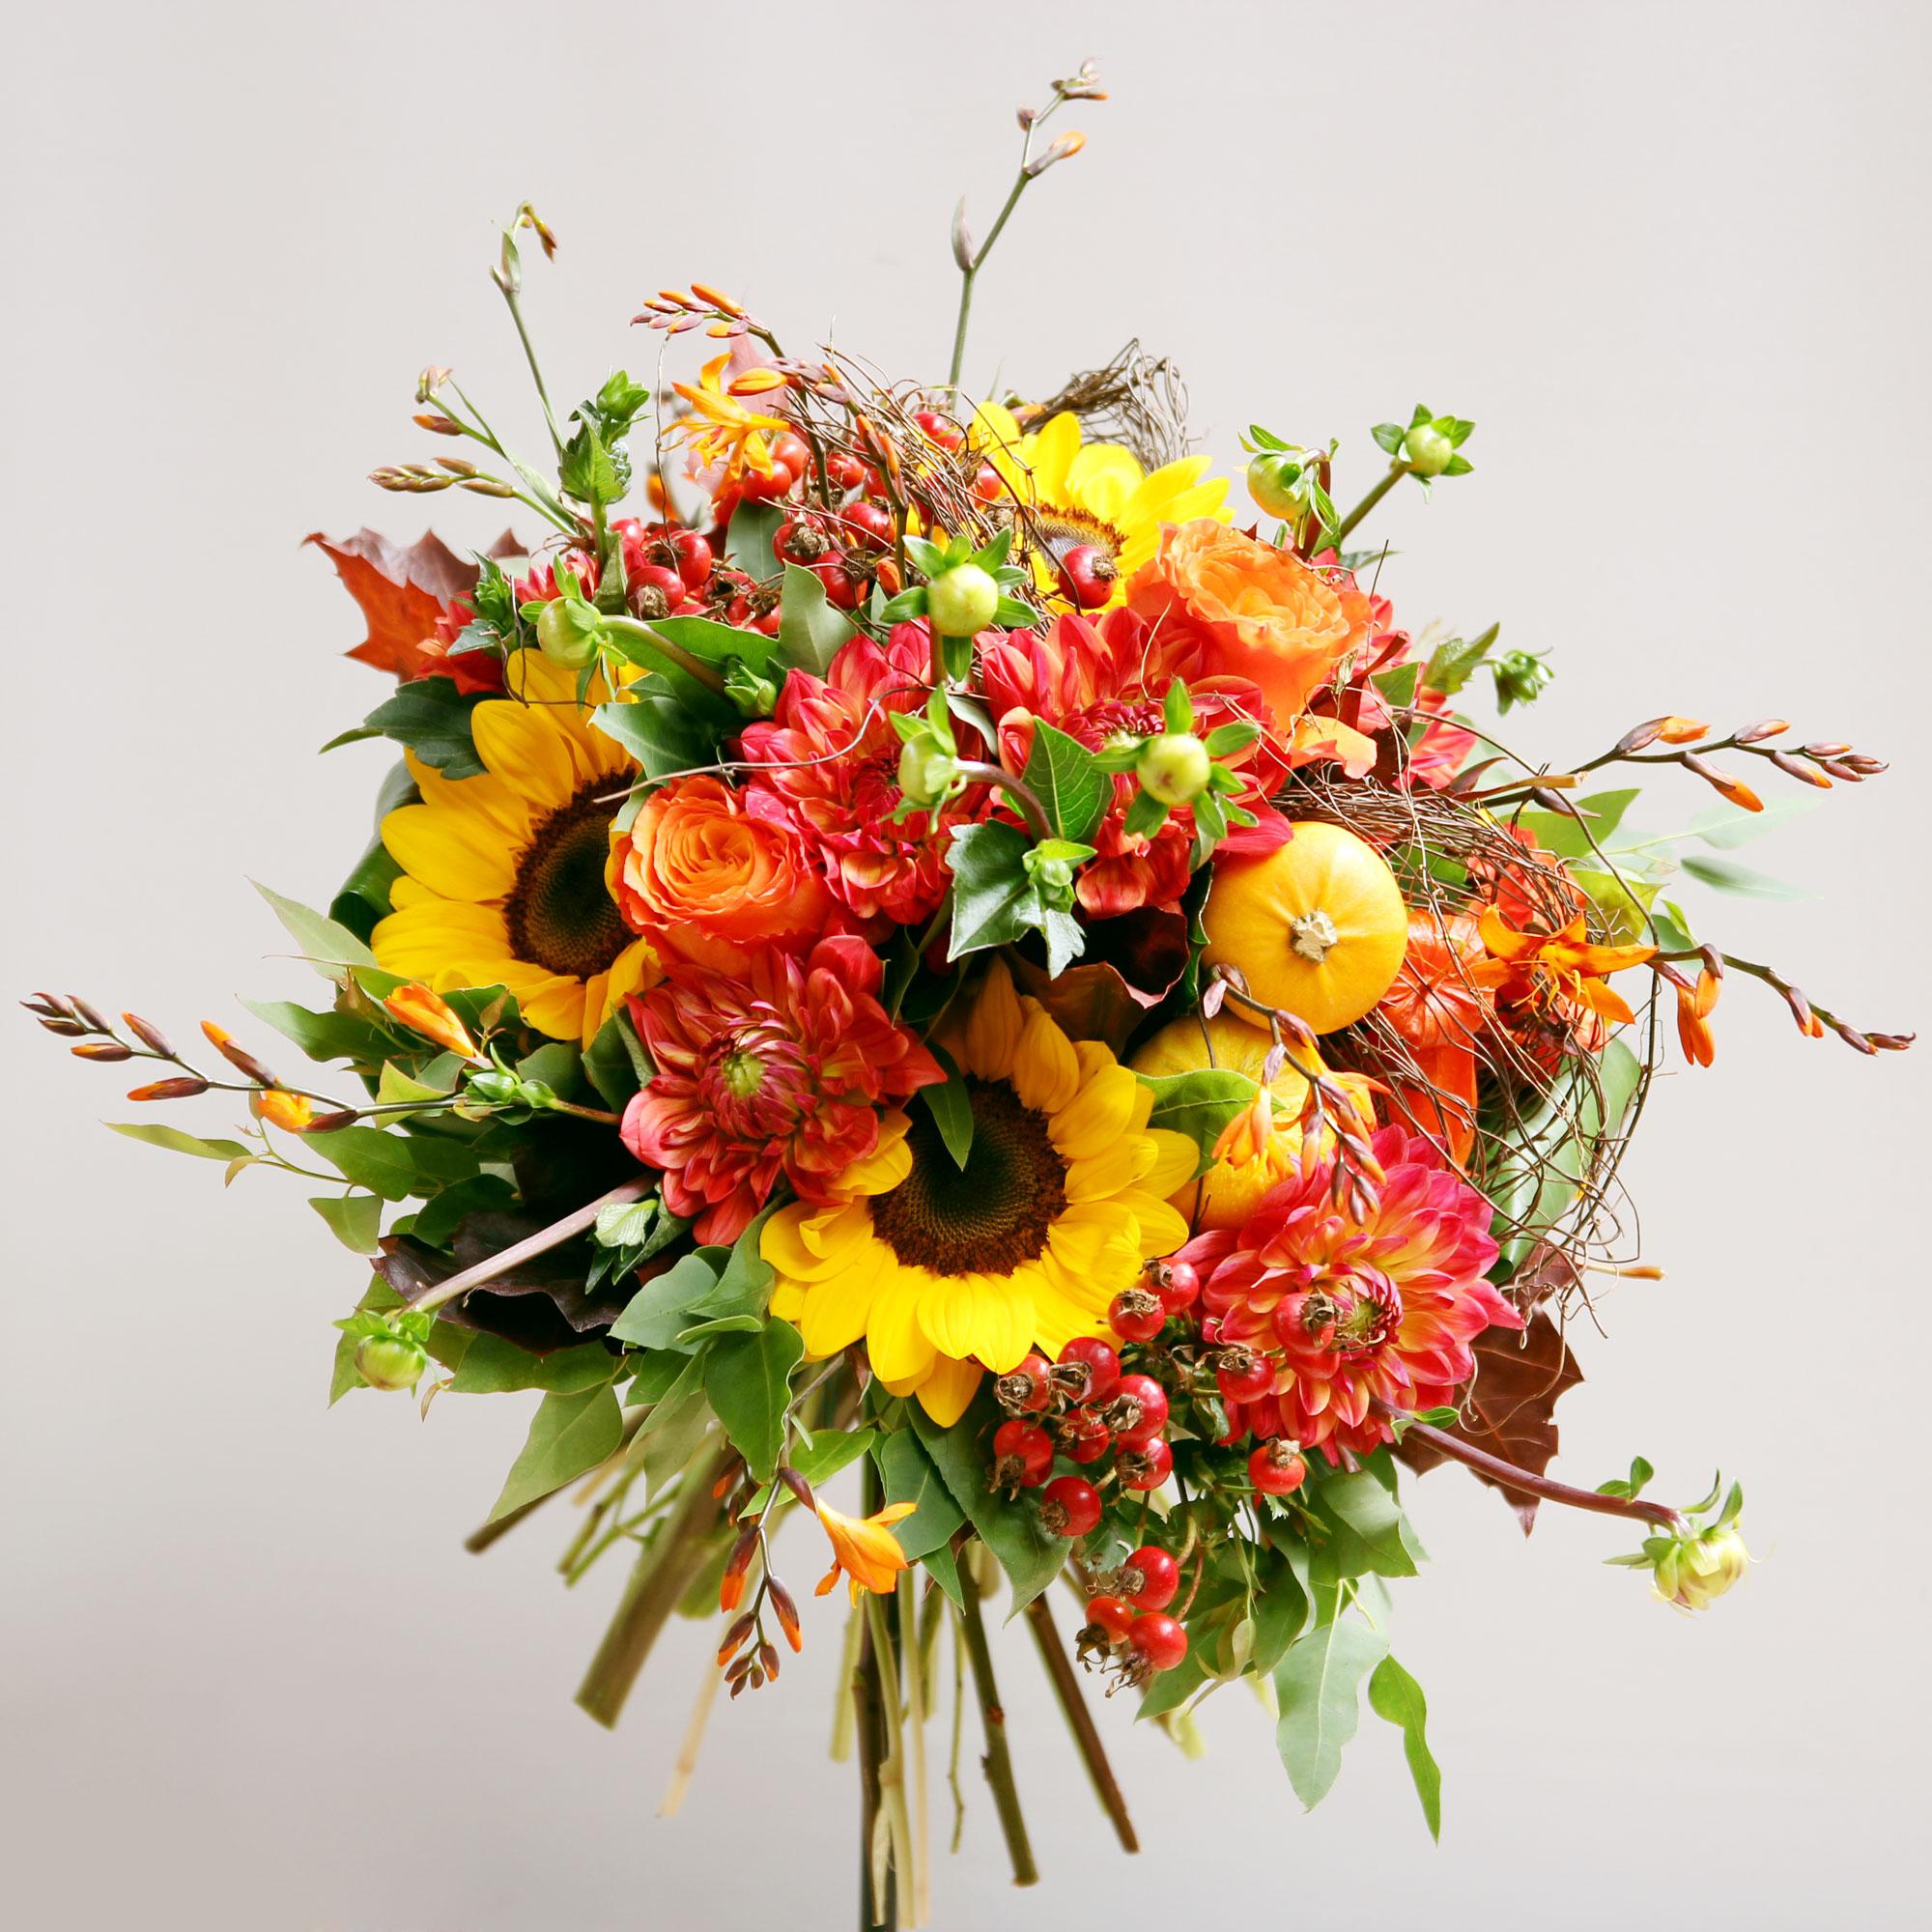 Bouquet de fleurs composé de tournesols, dahlias, crocosmias, baies de rose, roses.